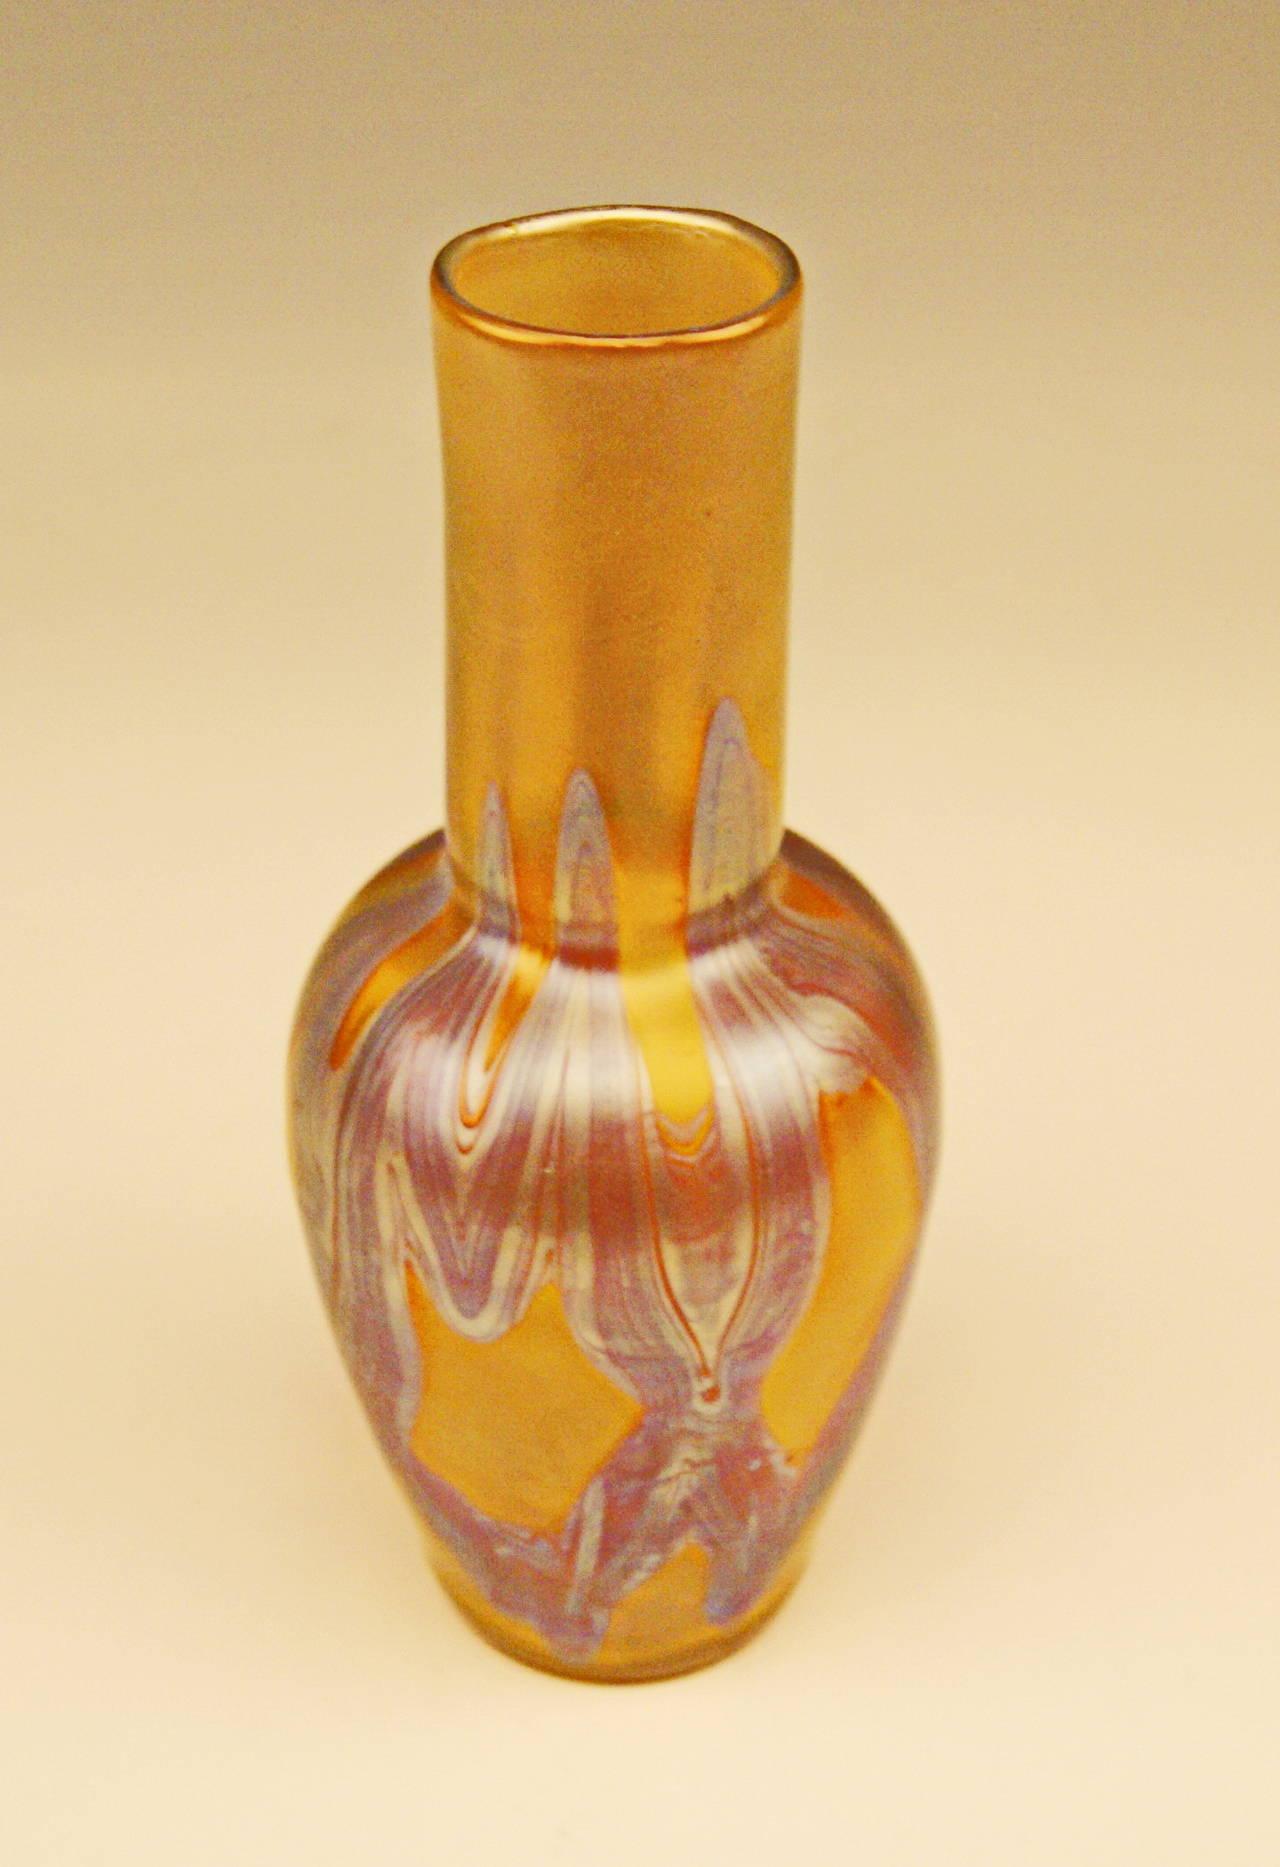 Vase Loetz Widow Art Nouveau with Phaenomen Decor, circa 1900 4